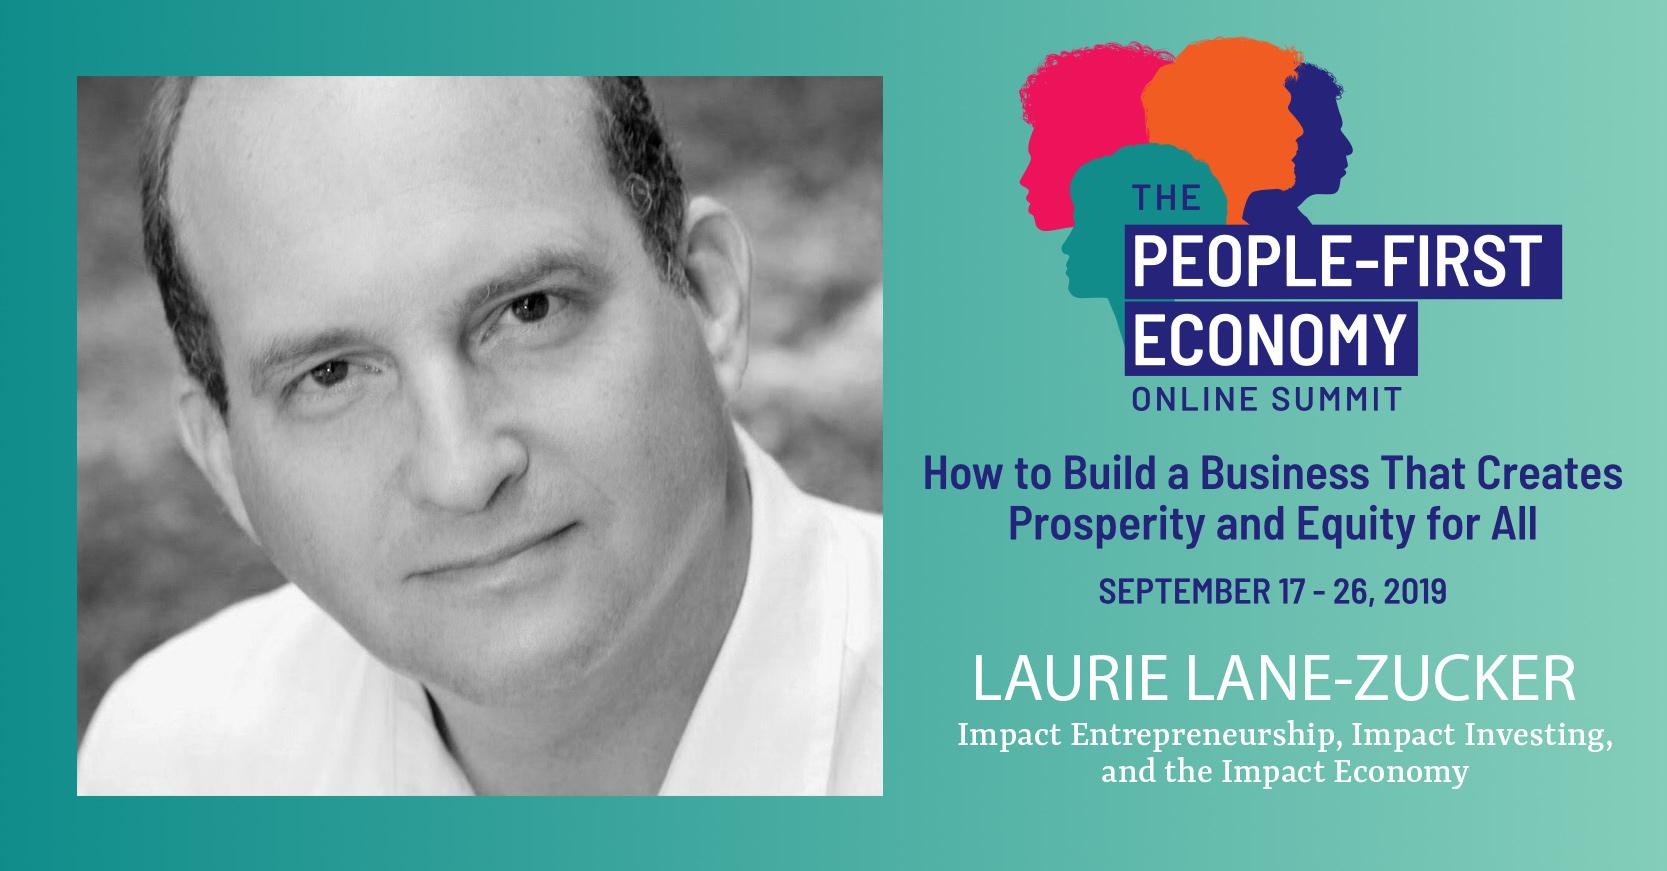 Laurie Lane-Zucker - BW.jpg